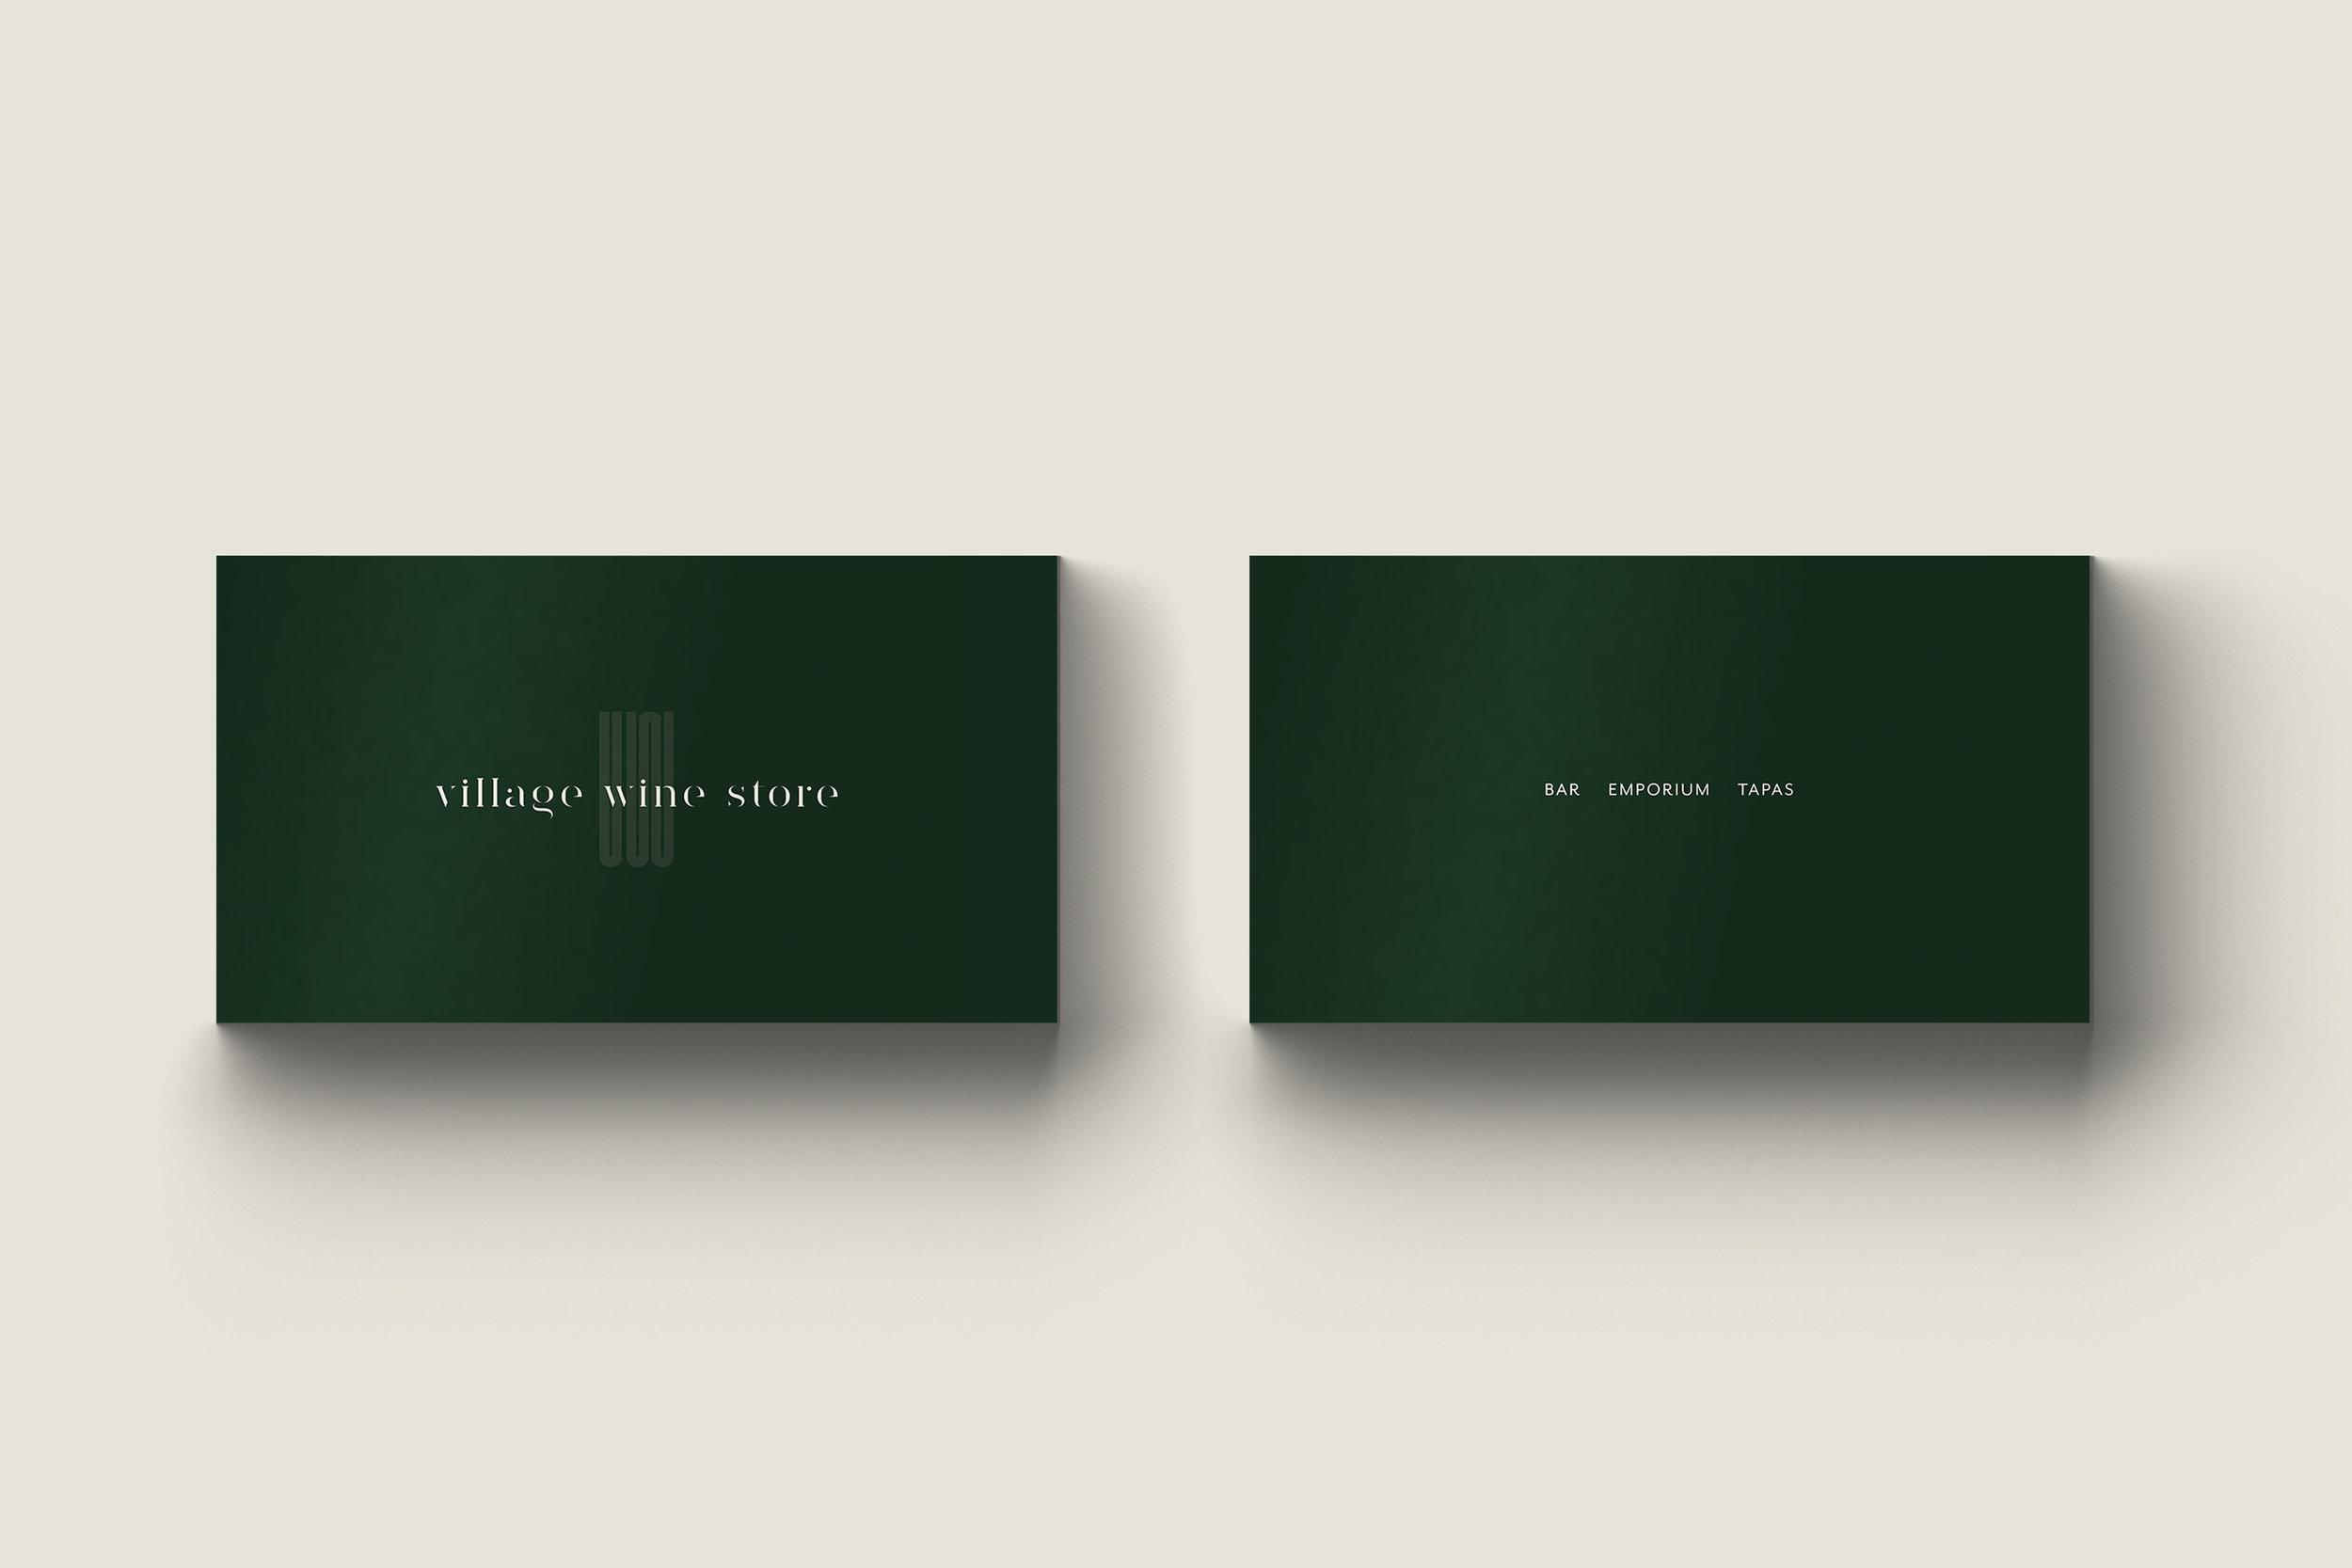 VWS business cards.jpg